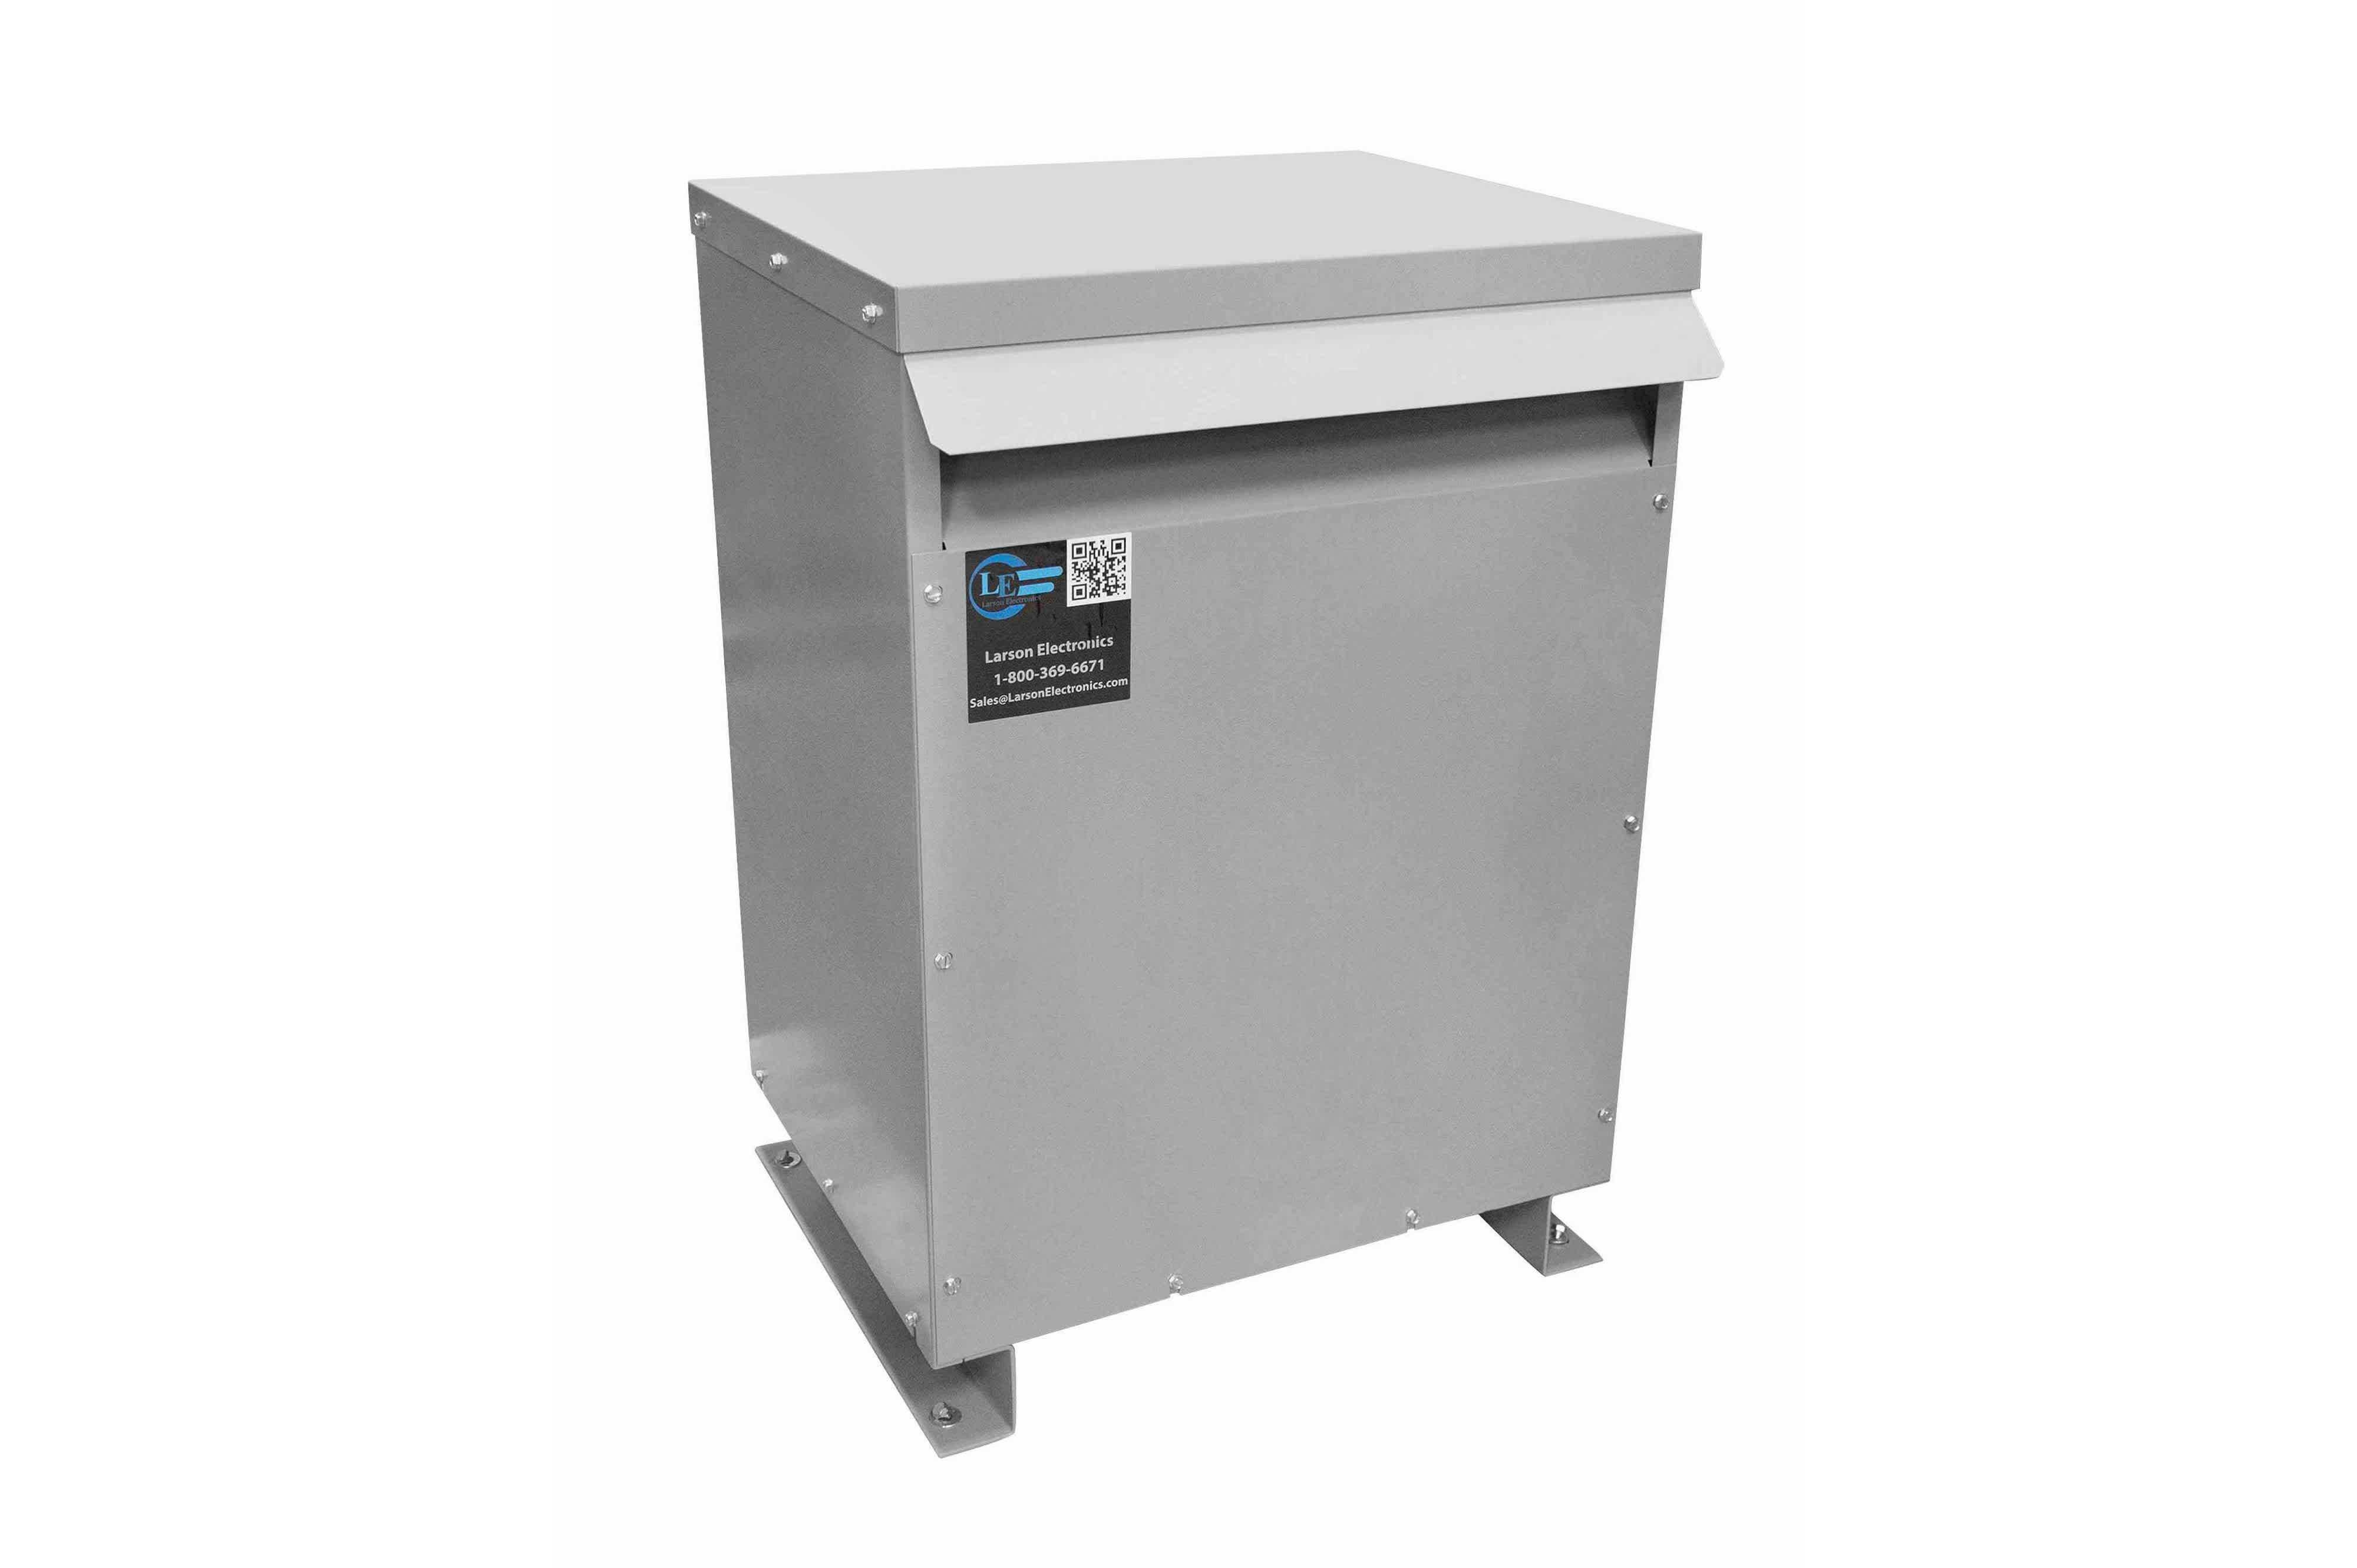 750 kVA 3PH Isolation Transformer, 400V Wye Primary, 208Y/120 Wye-N Secondary, N3R, Ventilated, 60 Hz